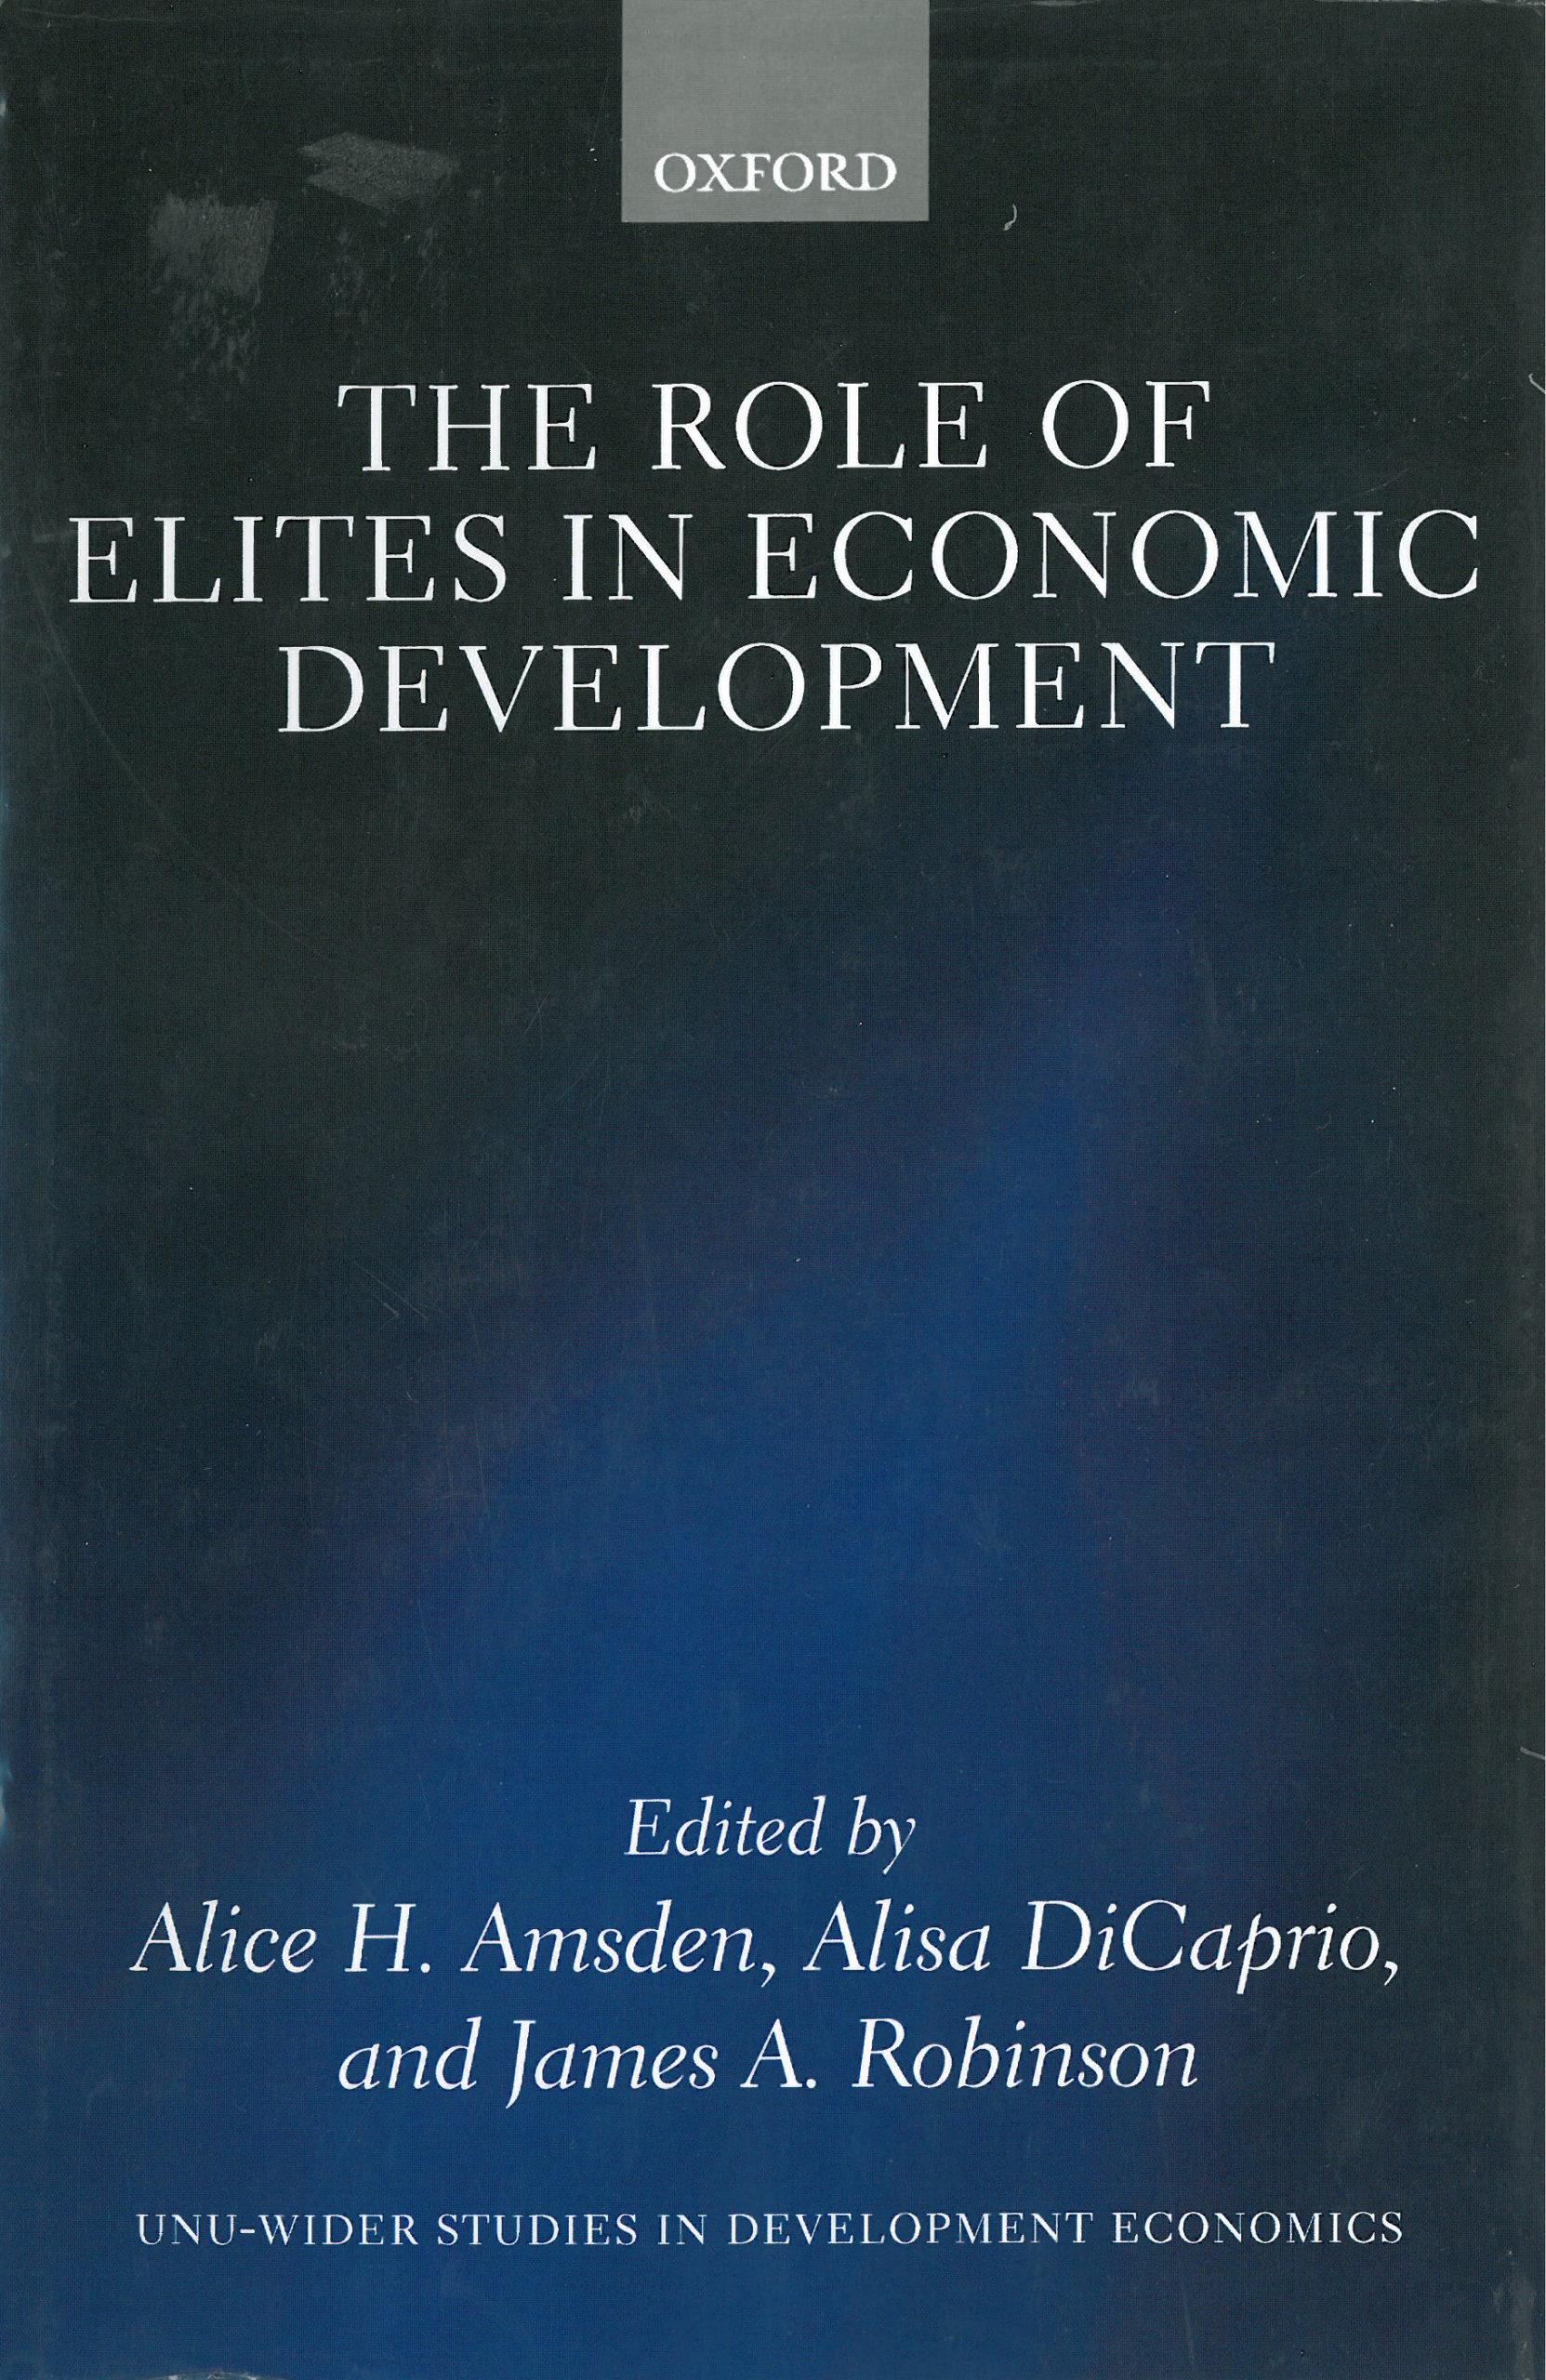 Alice H. Amsden, Alisa DiCaprio & James A. Robinson (toim.): The Roles of Elites in Development. Oxford University Press 2012, 400 s.